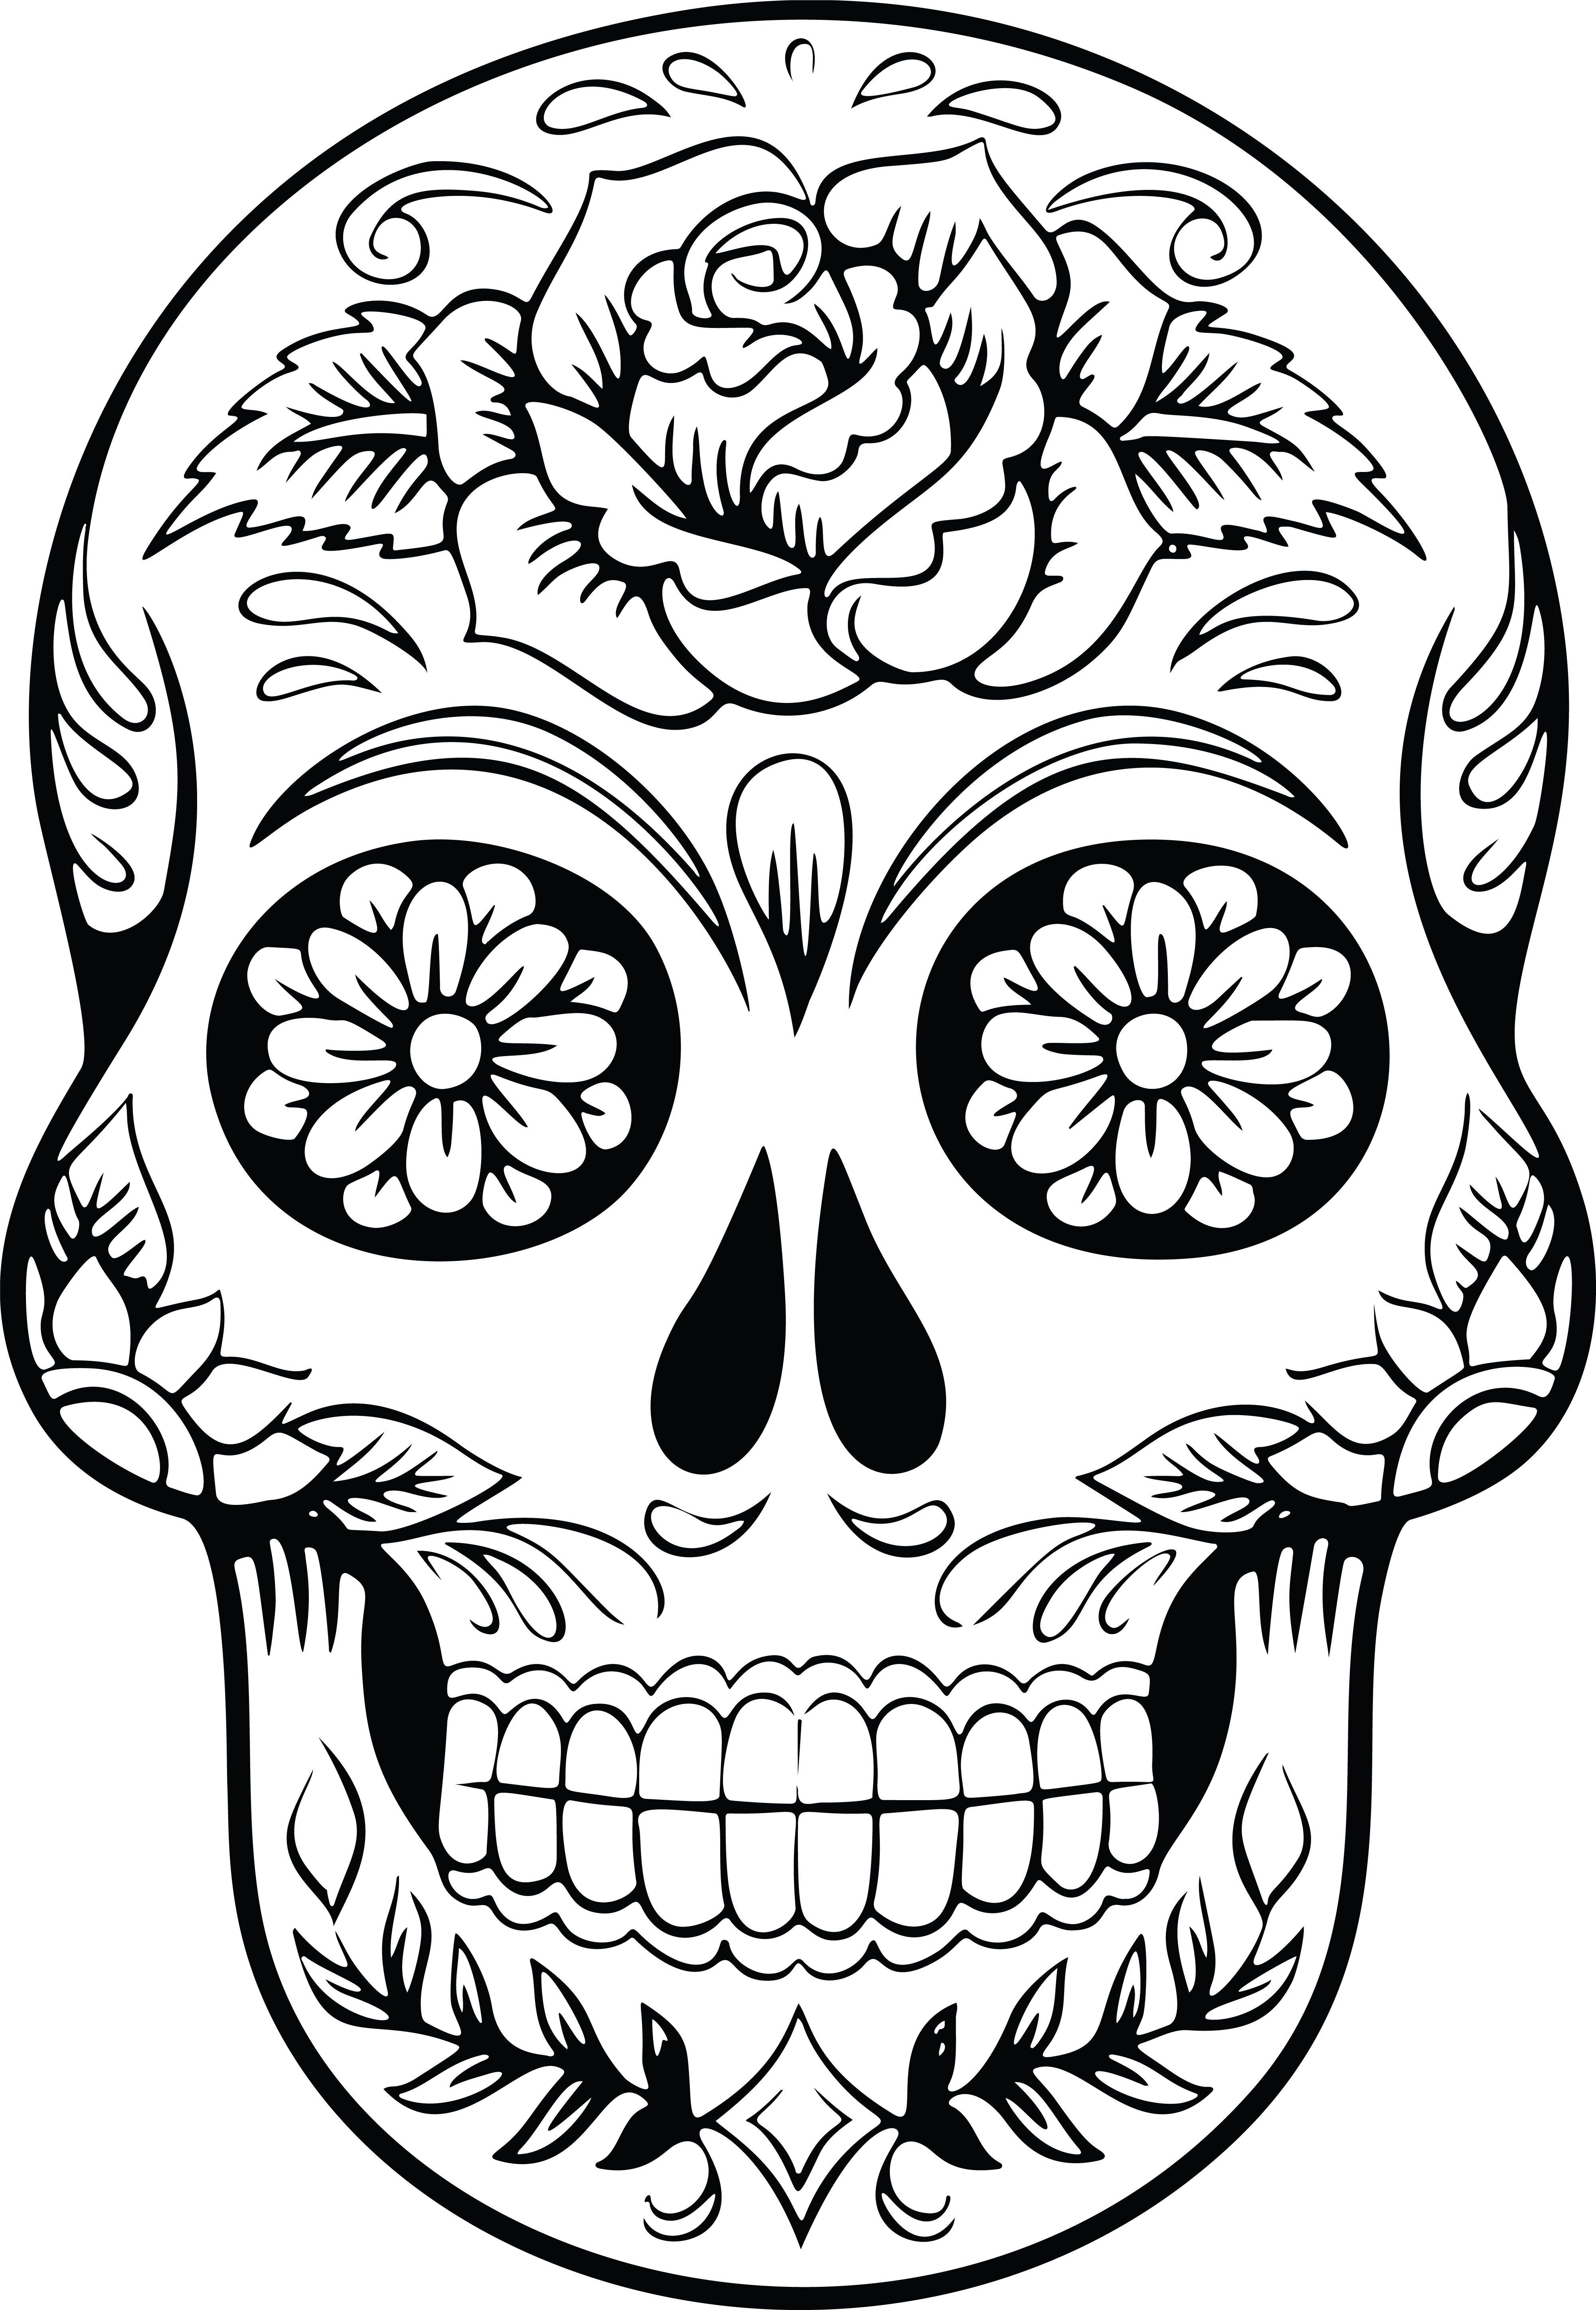 Free Clipart Of A Sugar Skull Skull Coloring Pages Sugar Skull Drawing Coloring Pages For Grown Ups